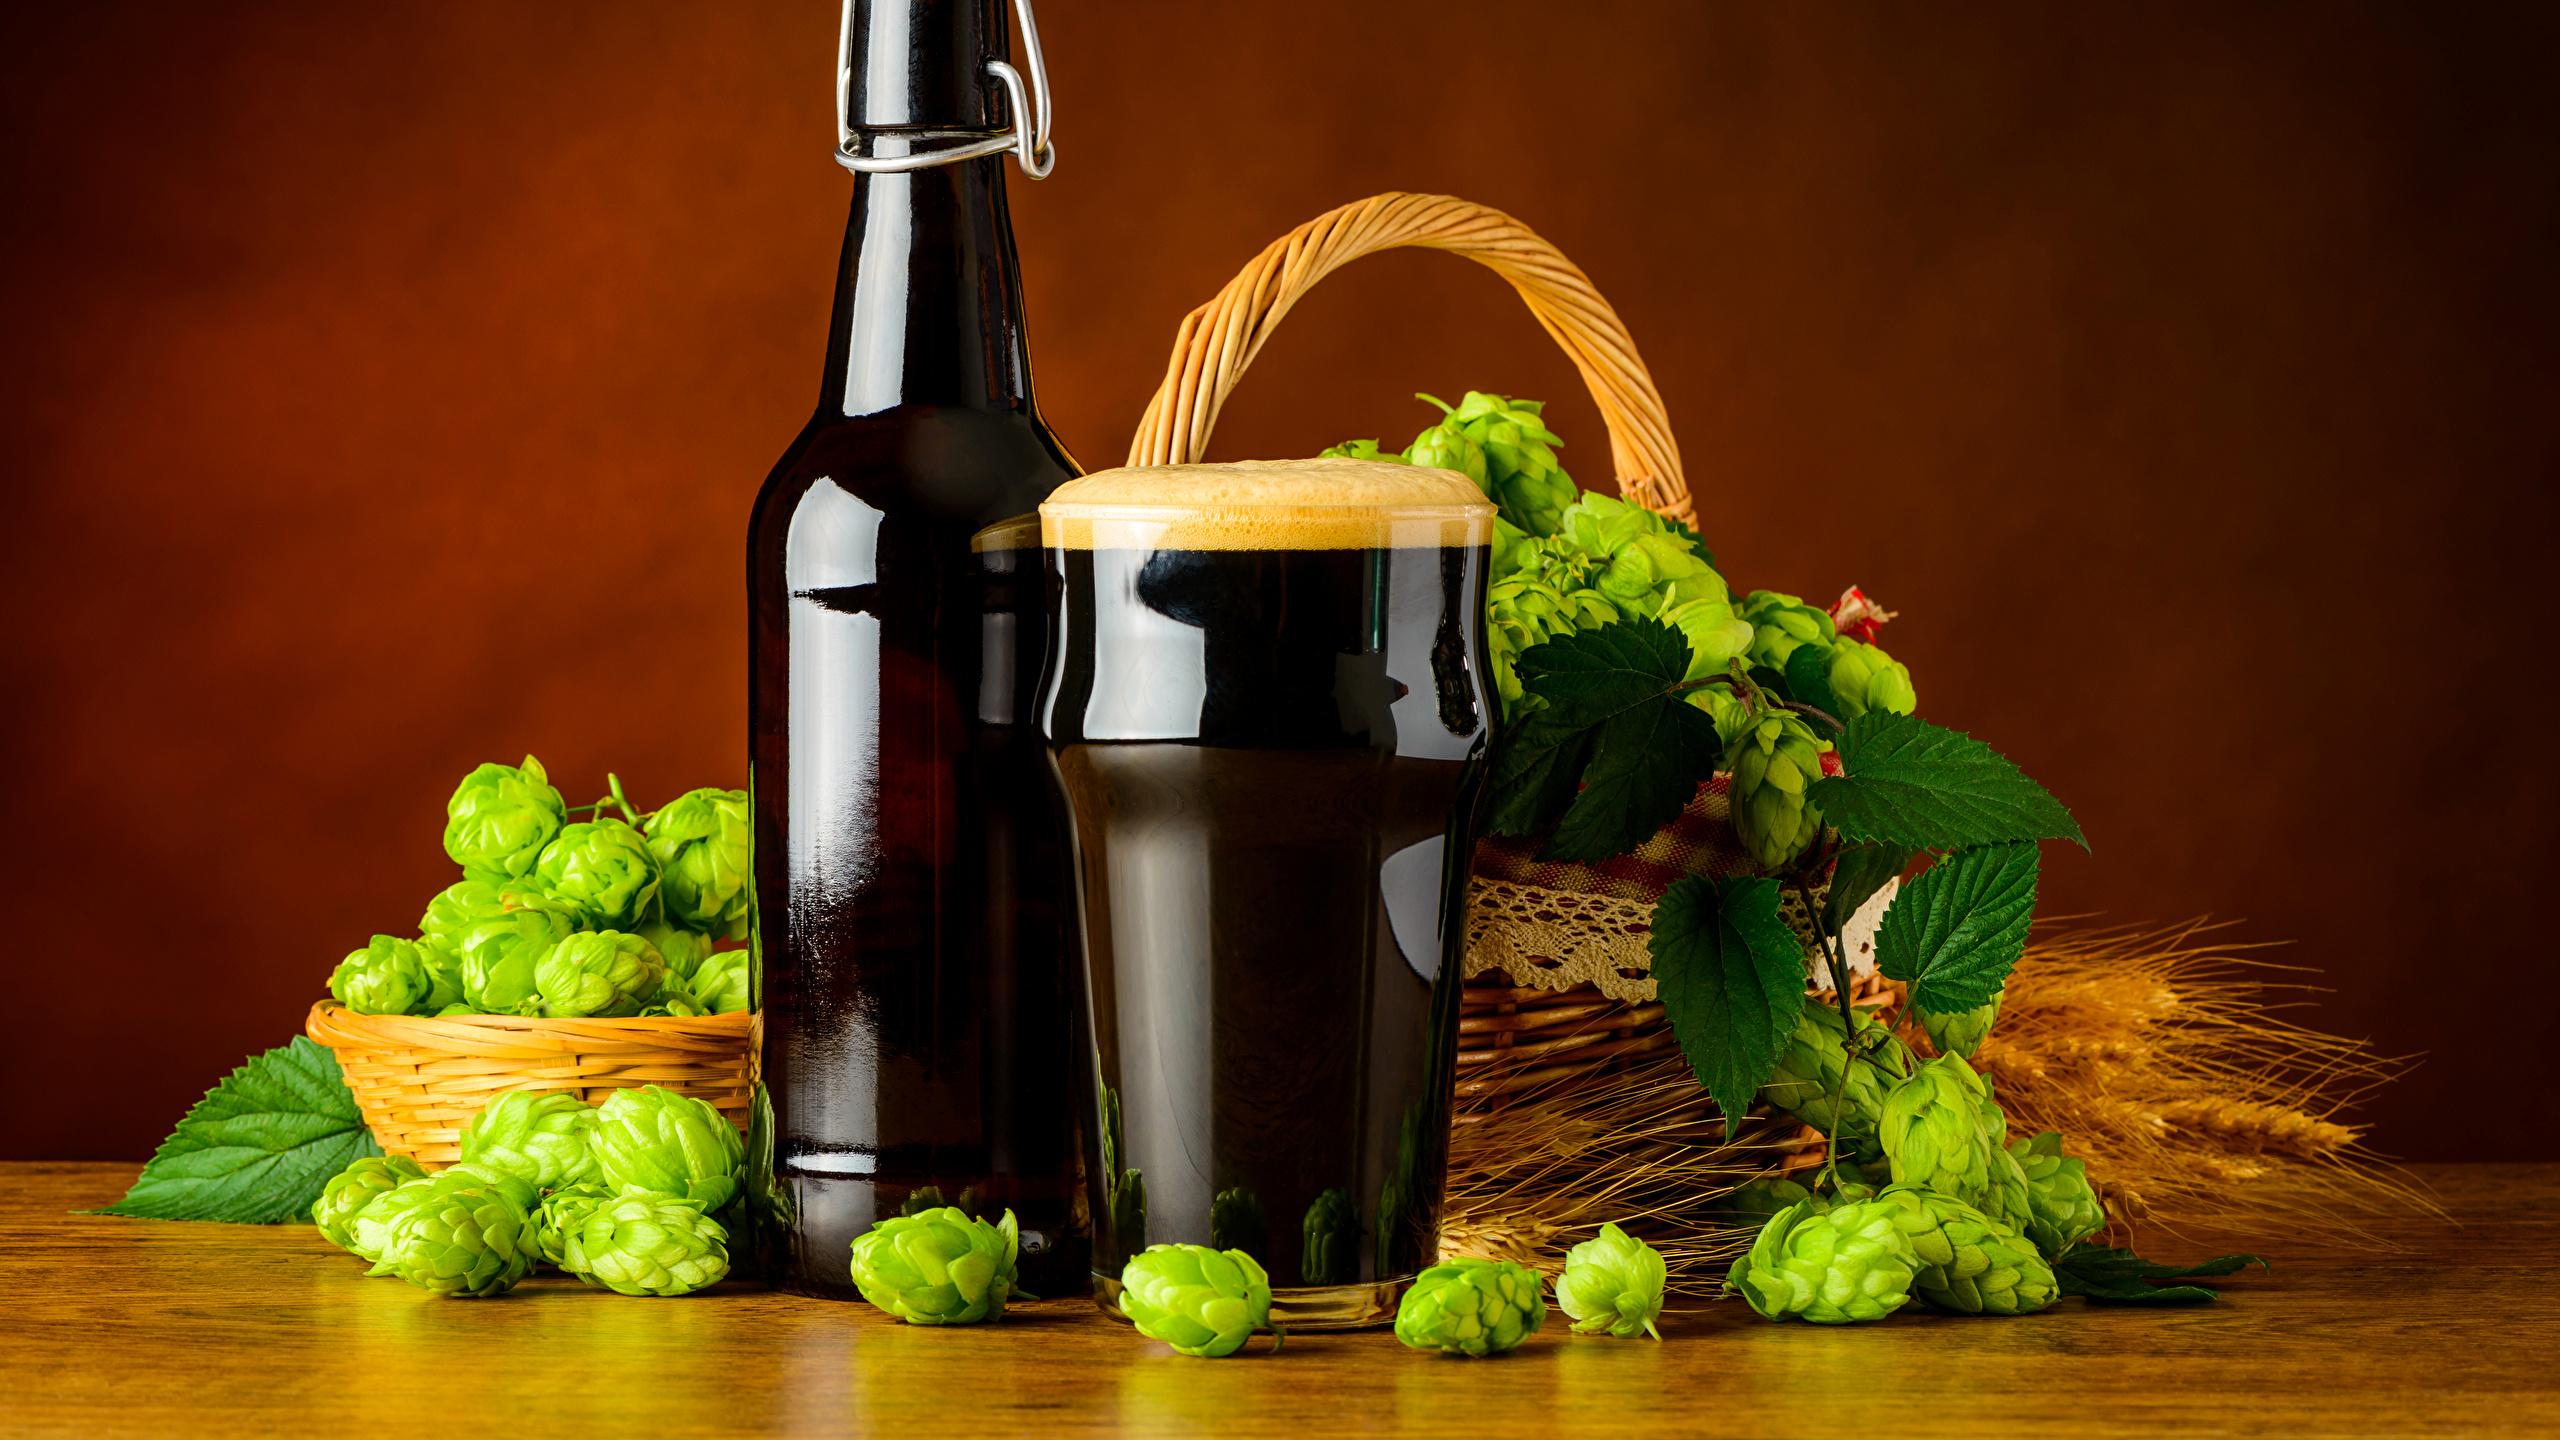 Картинки Пиво Хмель Стакан Пища Пена Бутылка 2560x1440 стакана стакане Еда пене пеной бутылки Продукты питания